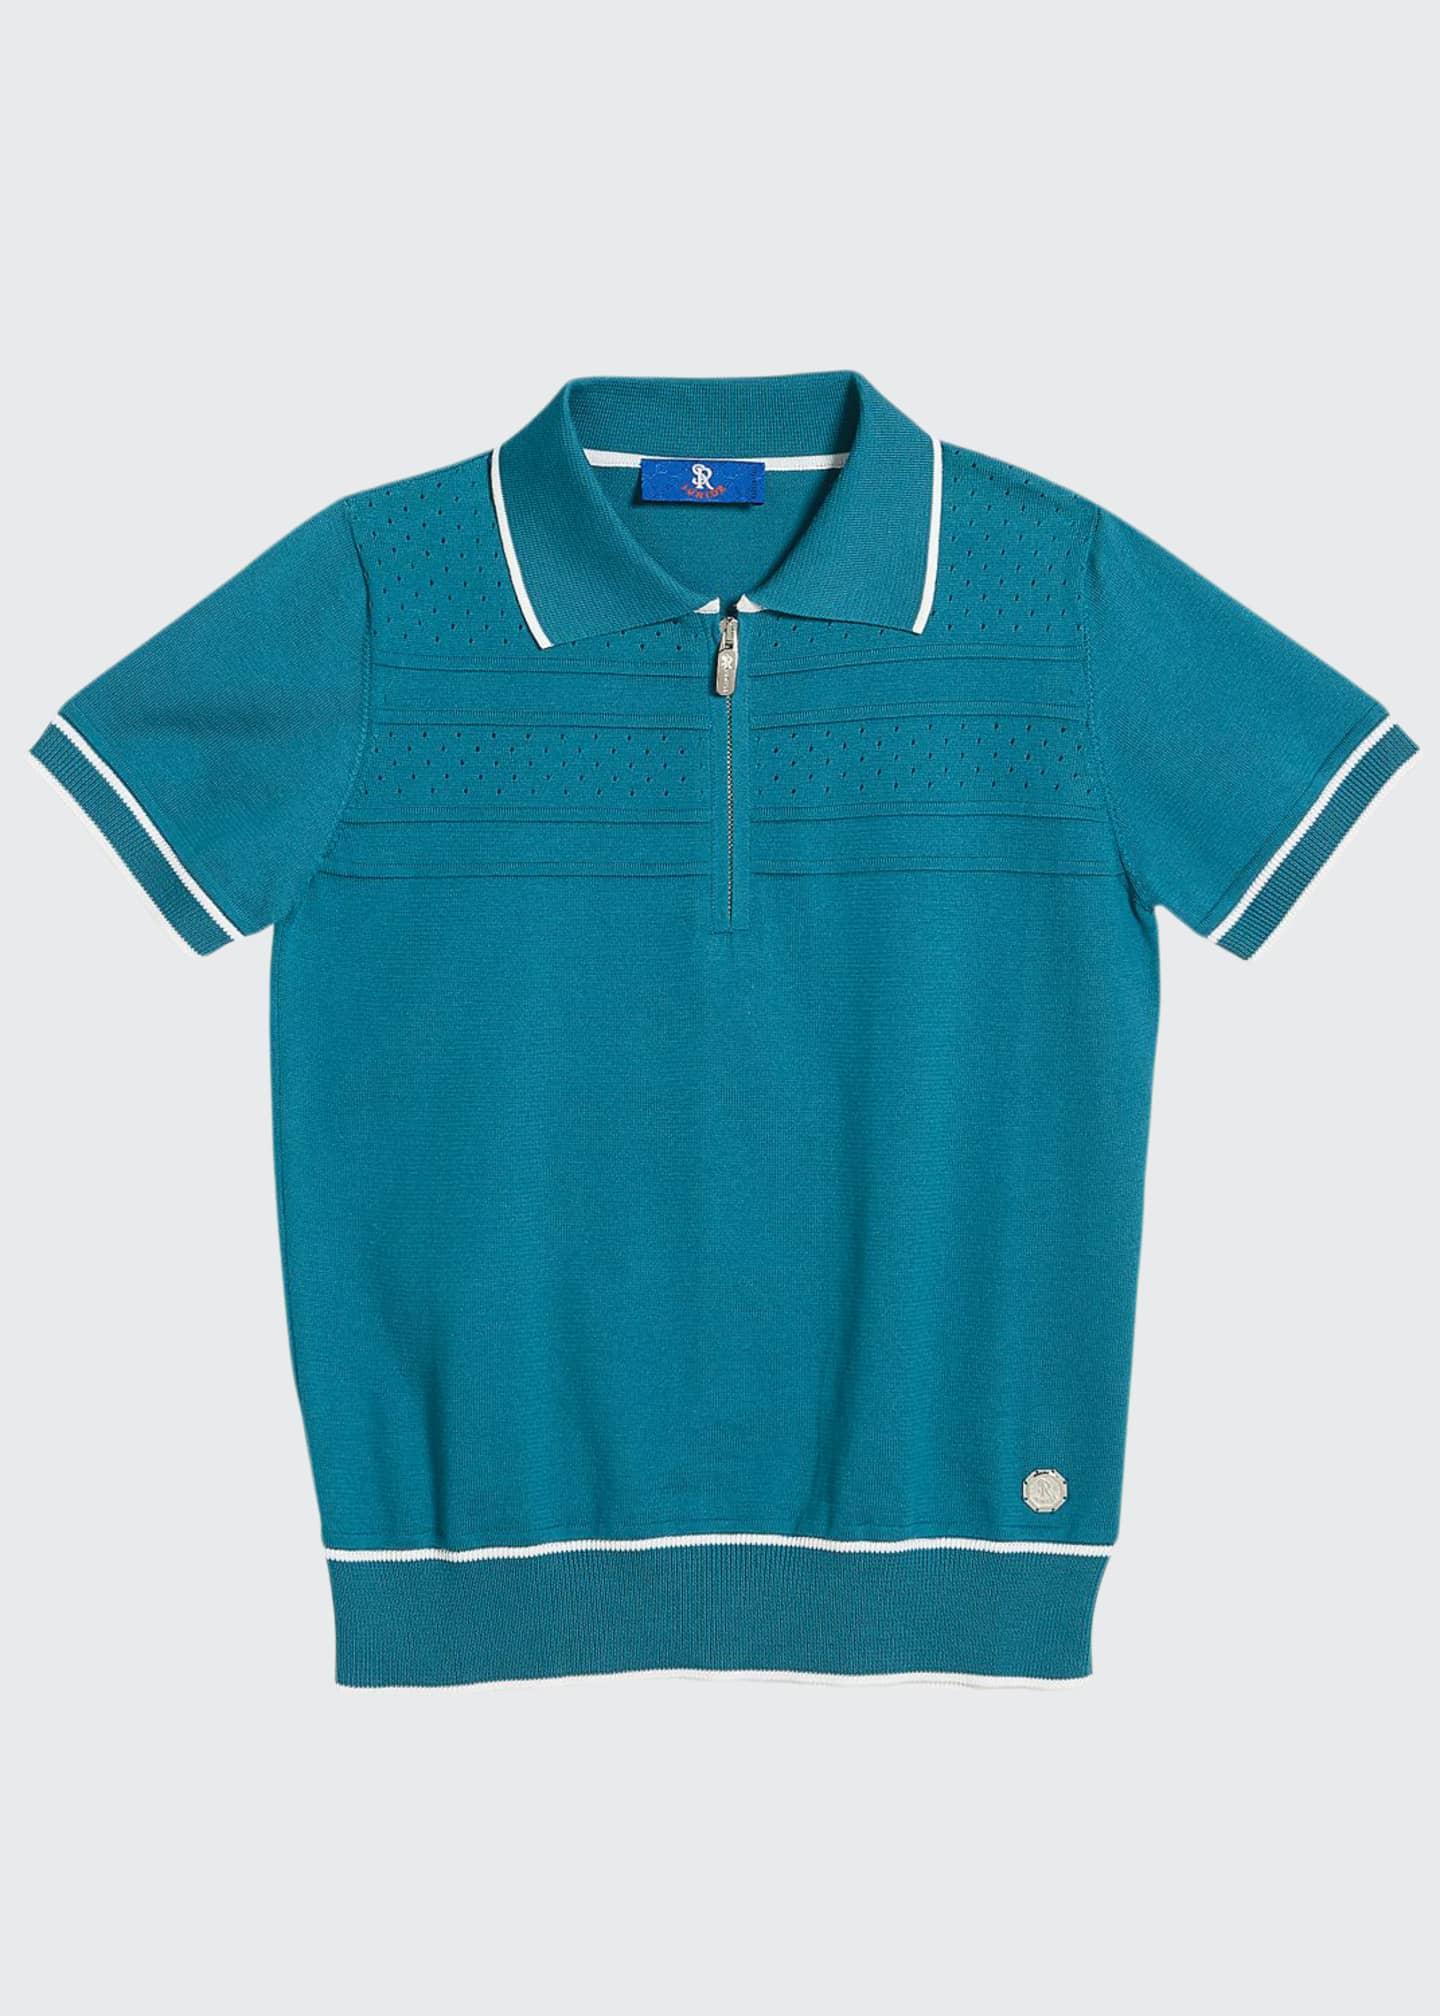 Stefano Ricci Boys' Short-Sleeve Knit Polo Sweater, Size